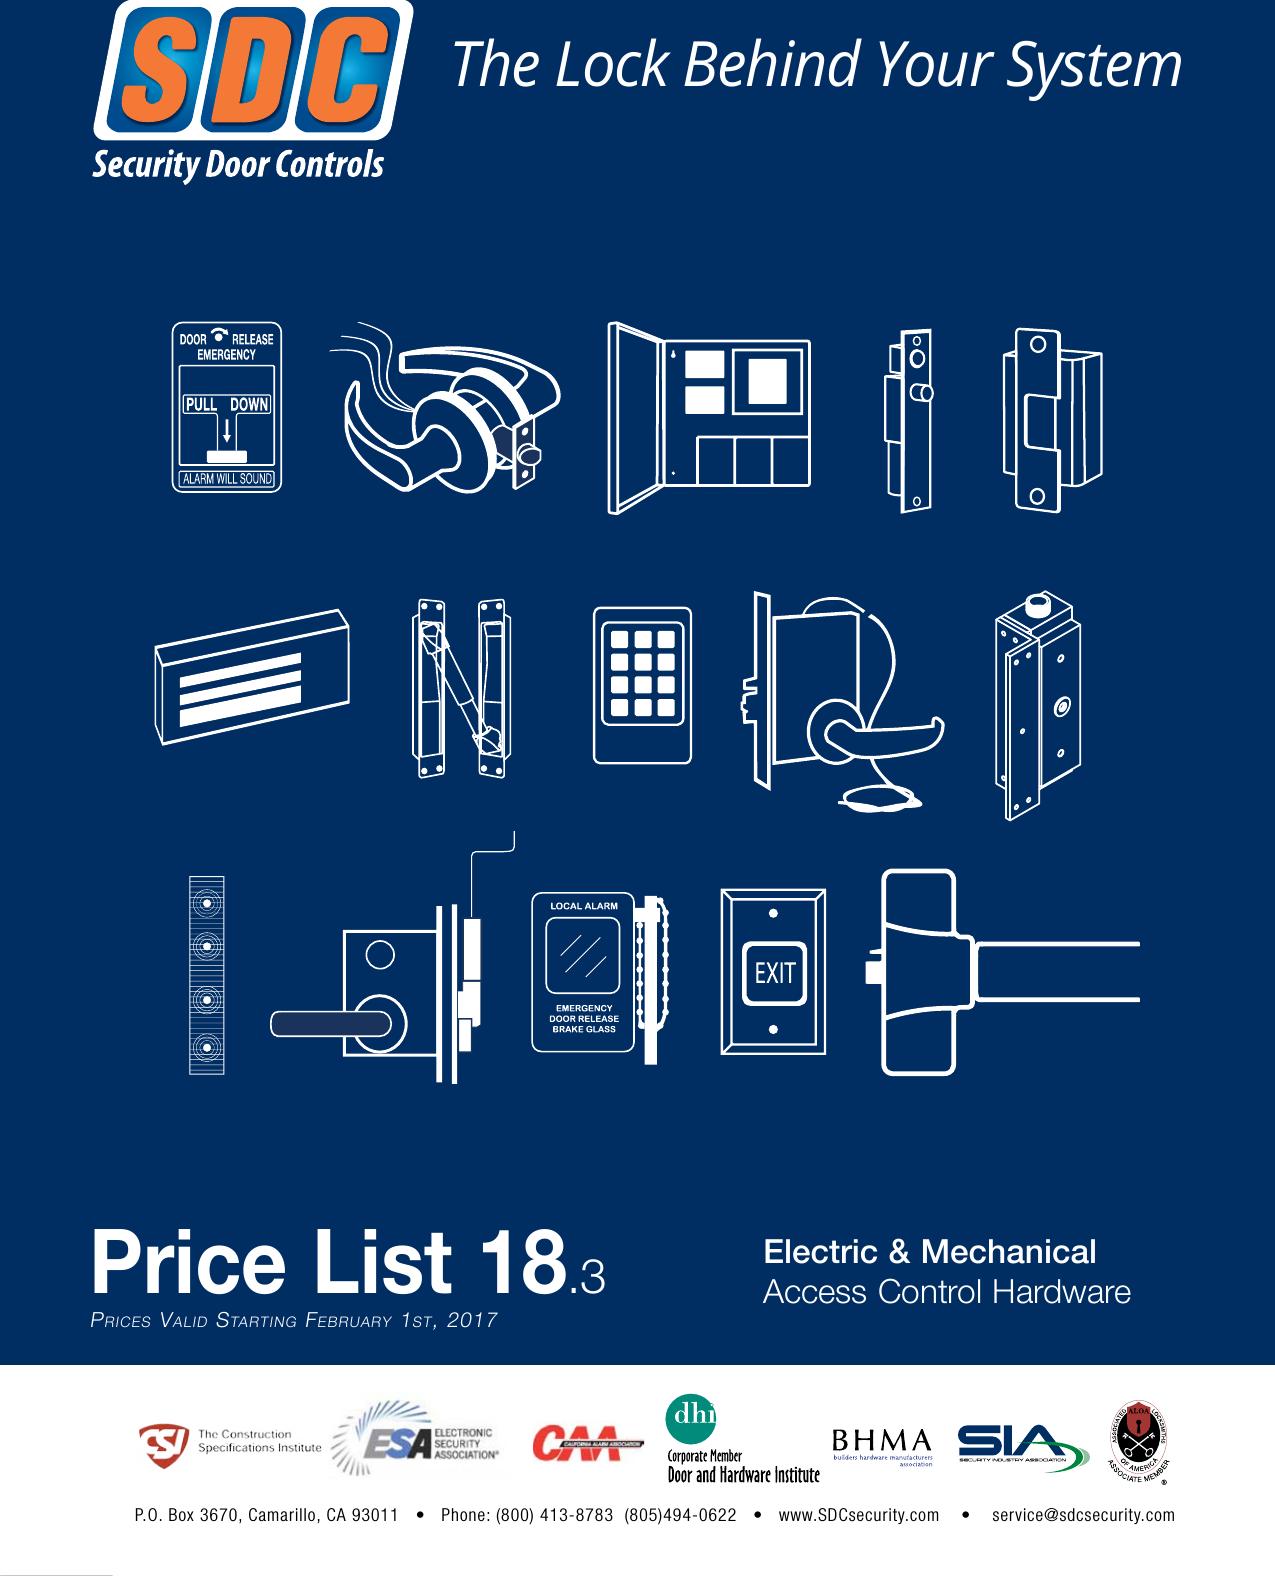 SDC Price List #18 Book SDCPrice List18.3 on